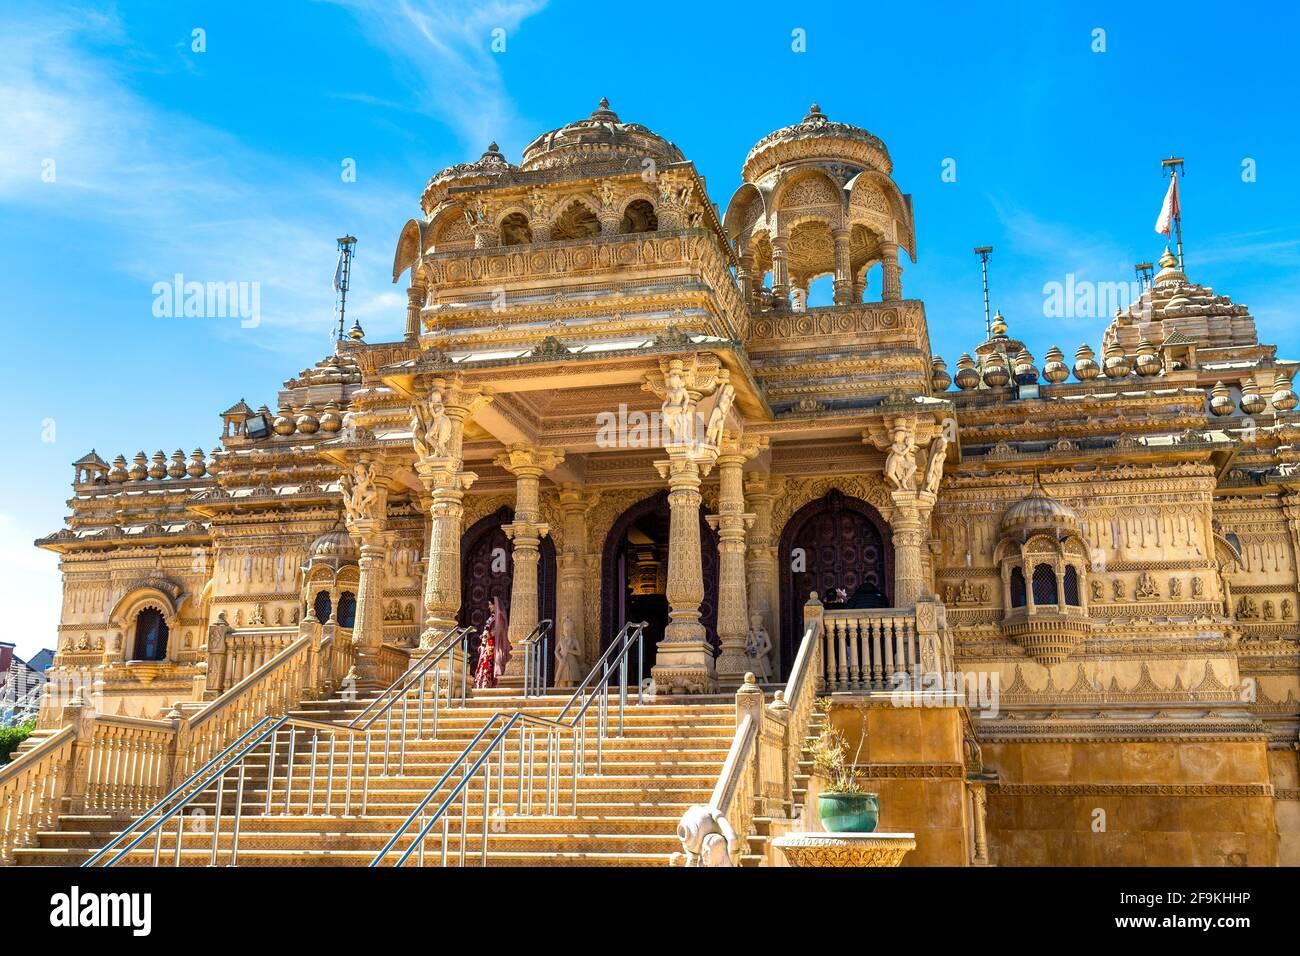 Ornate limestone Hindu temple Shri Vallabh Nidhi Mandir in Alperton, Wembley, London, UK Stock Photo